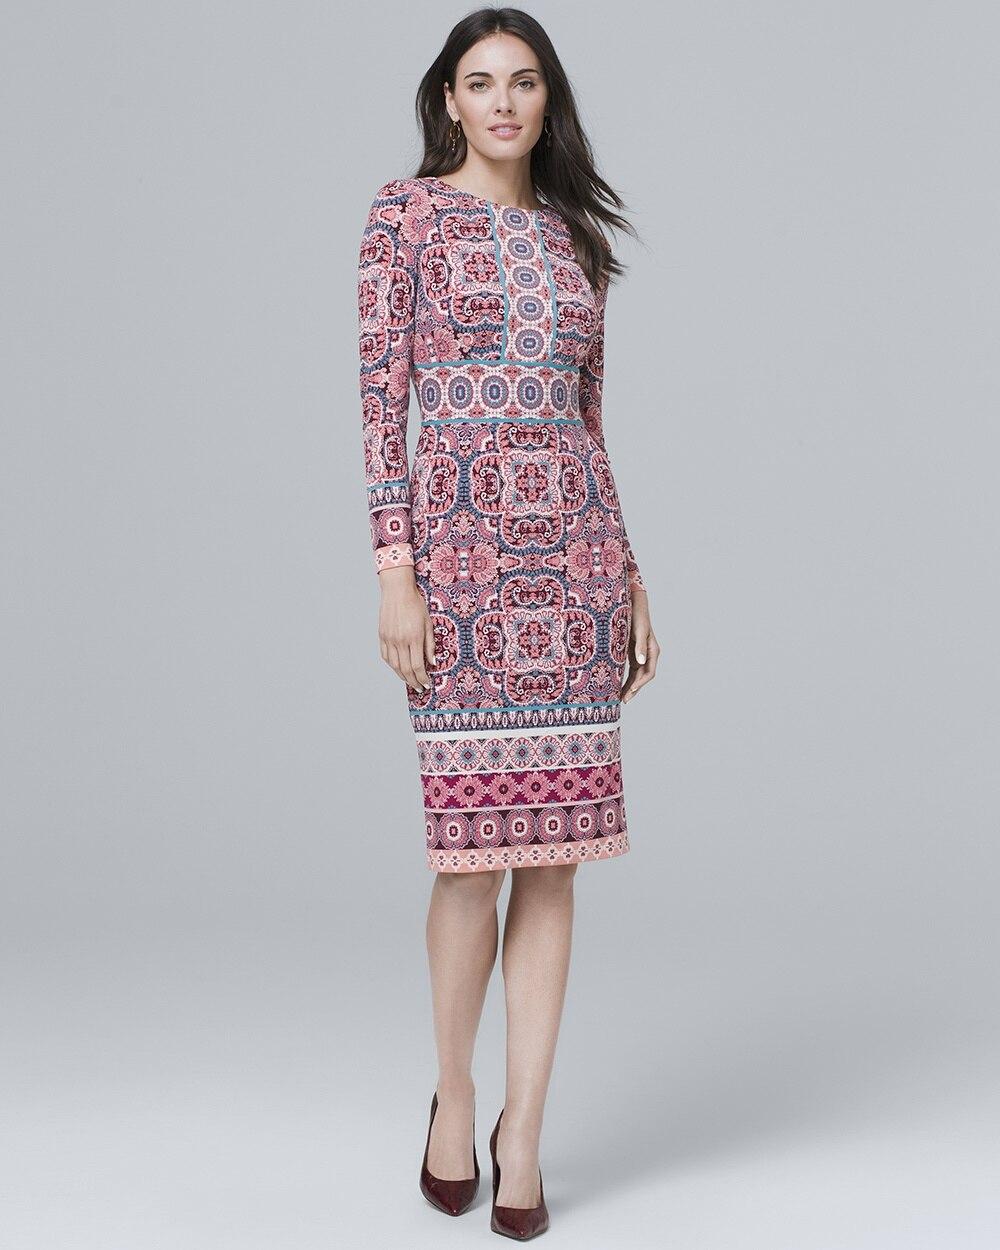 23161f104ec4 Medallion-Print Knit Sheath Dress - White House Black Market